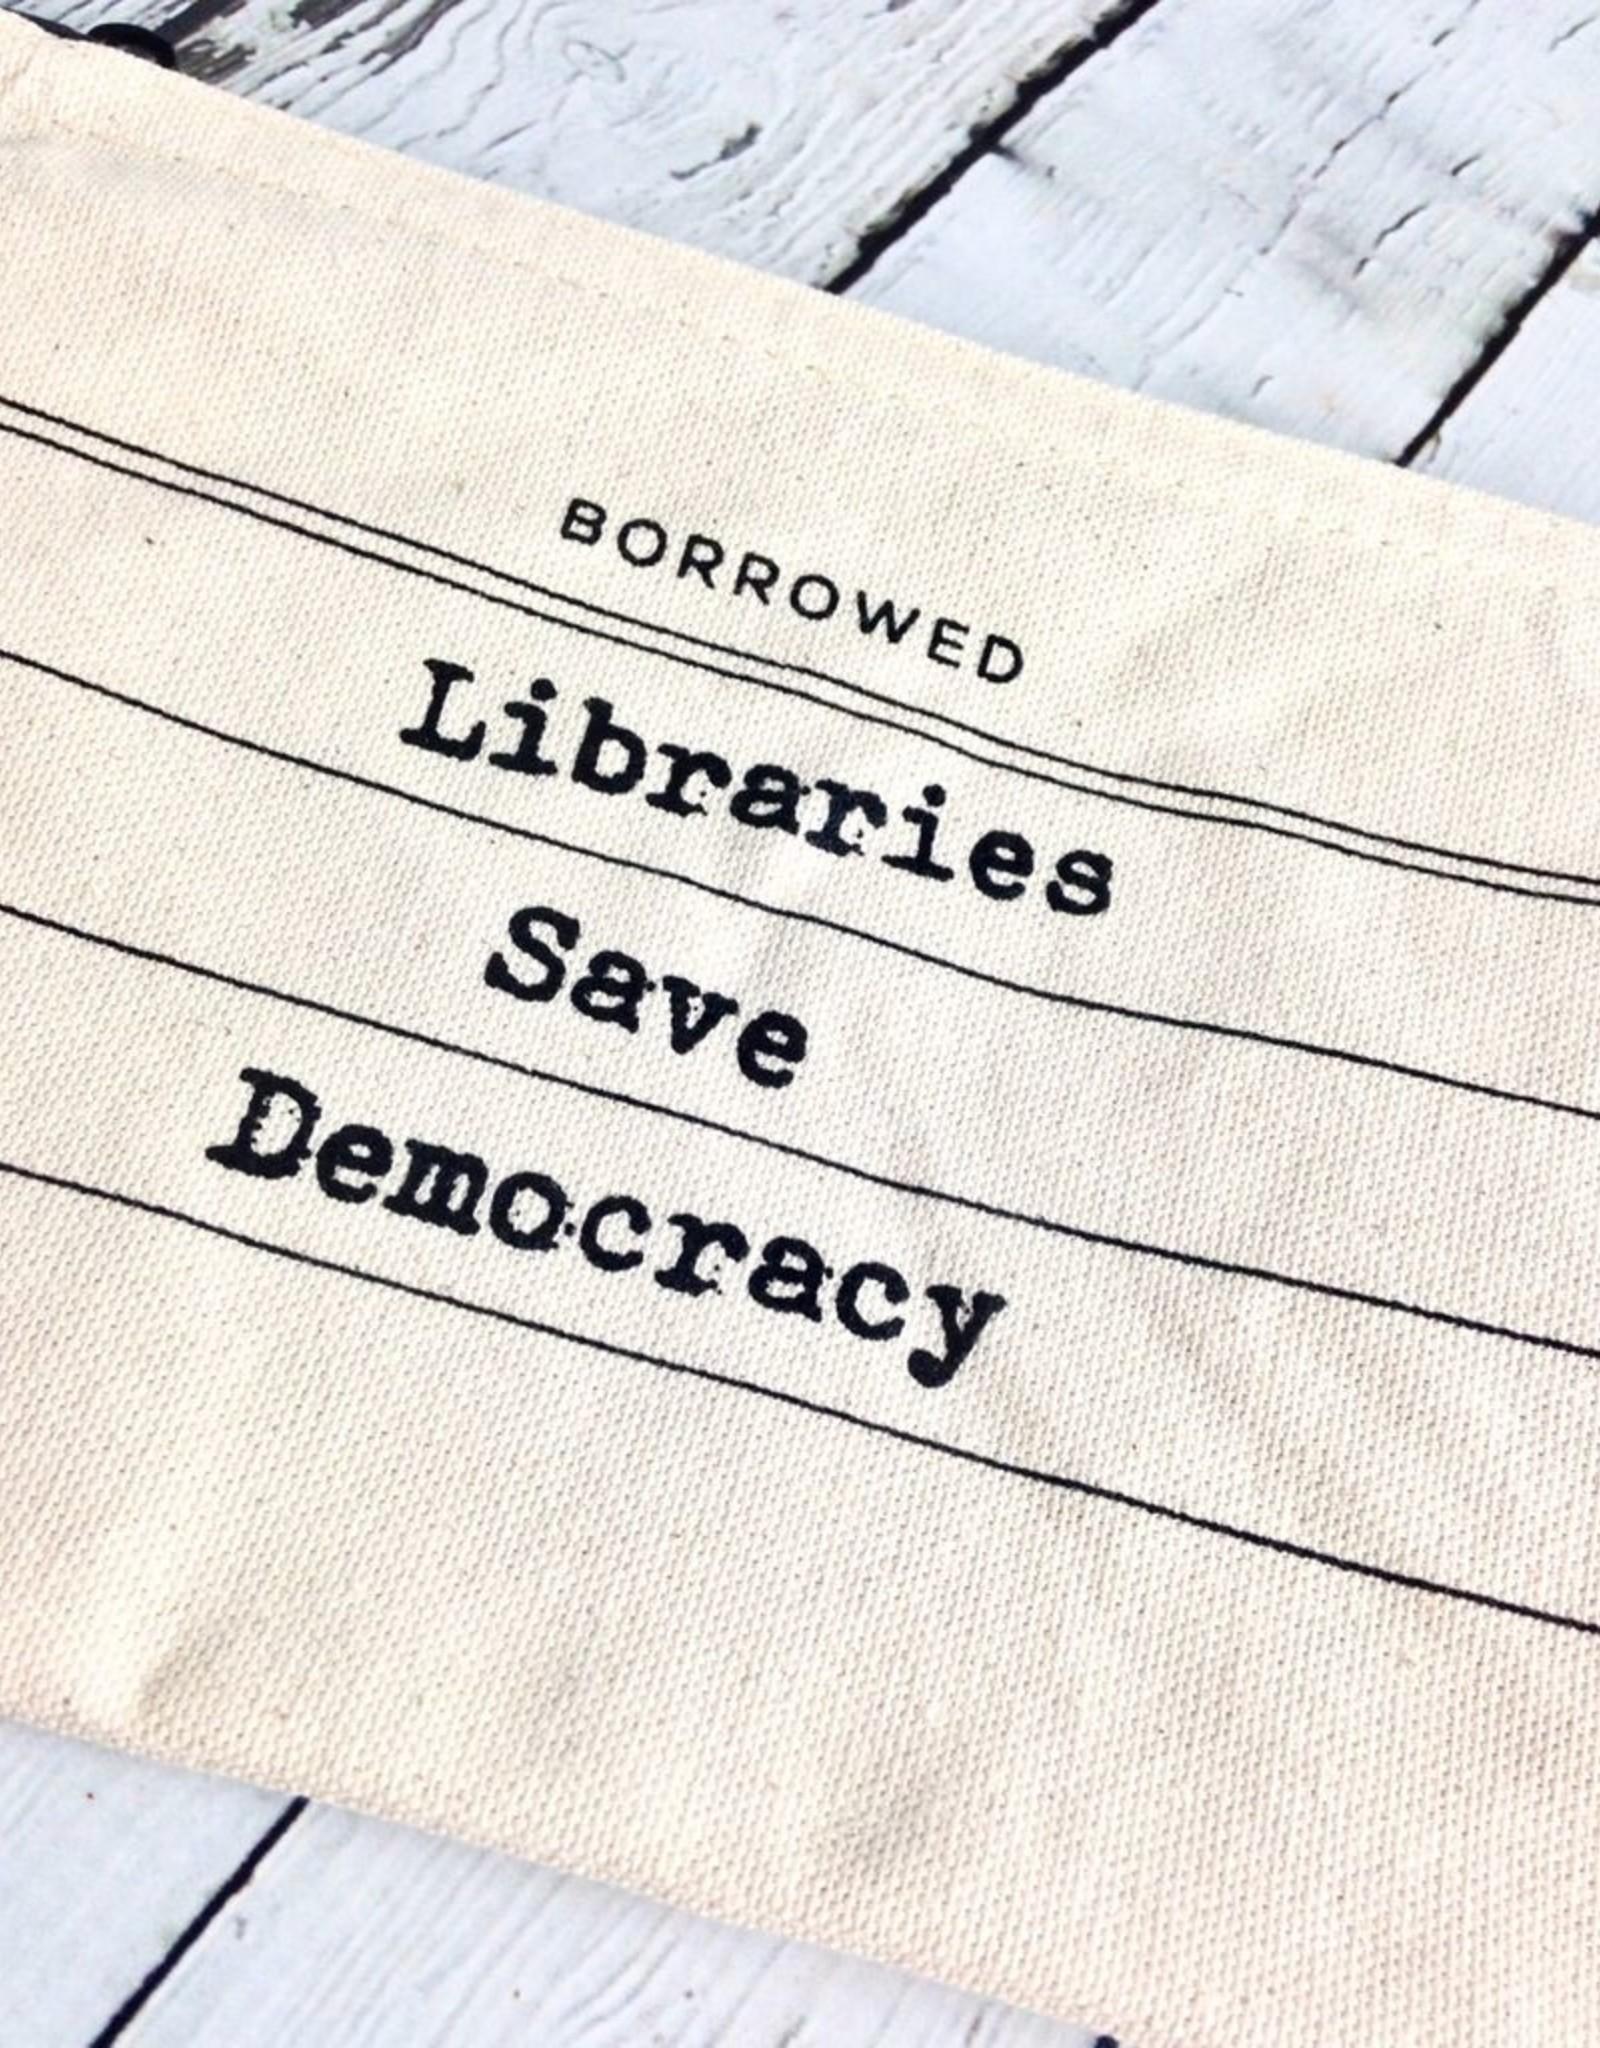 Libraries Save Democracy Zip Pouch Pencil Case